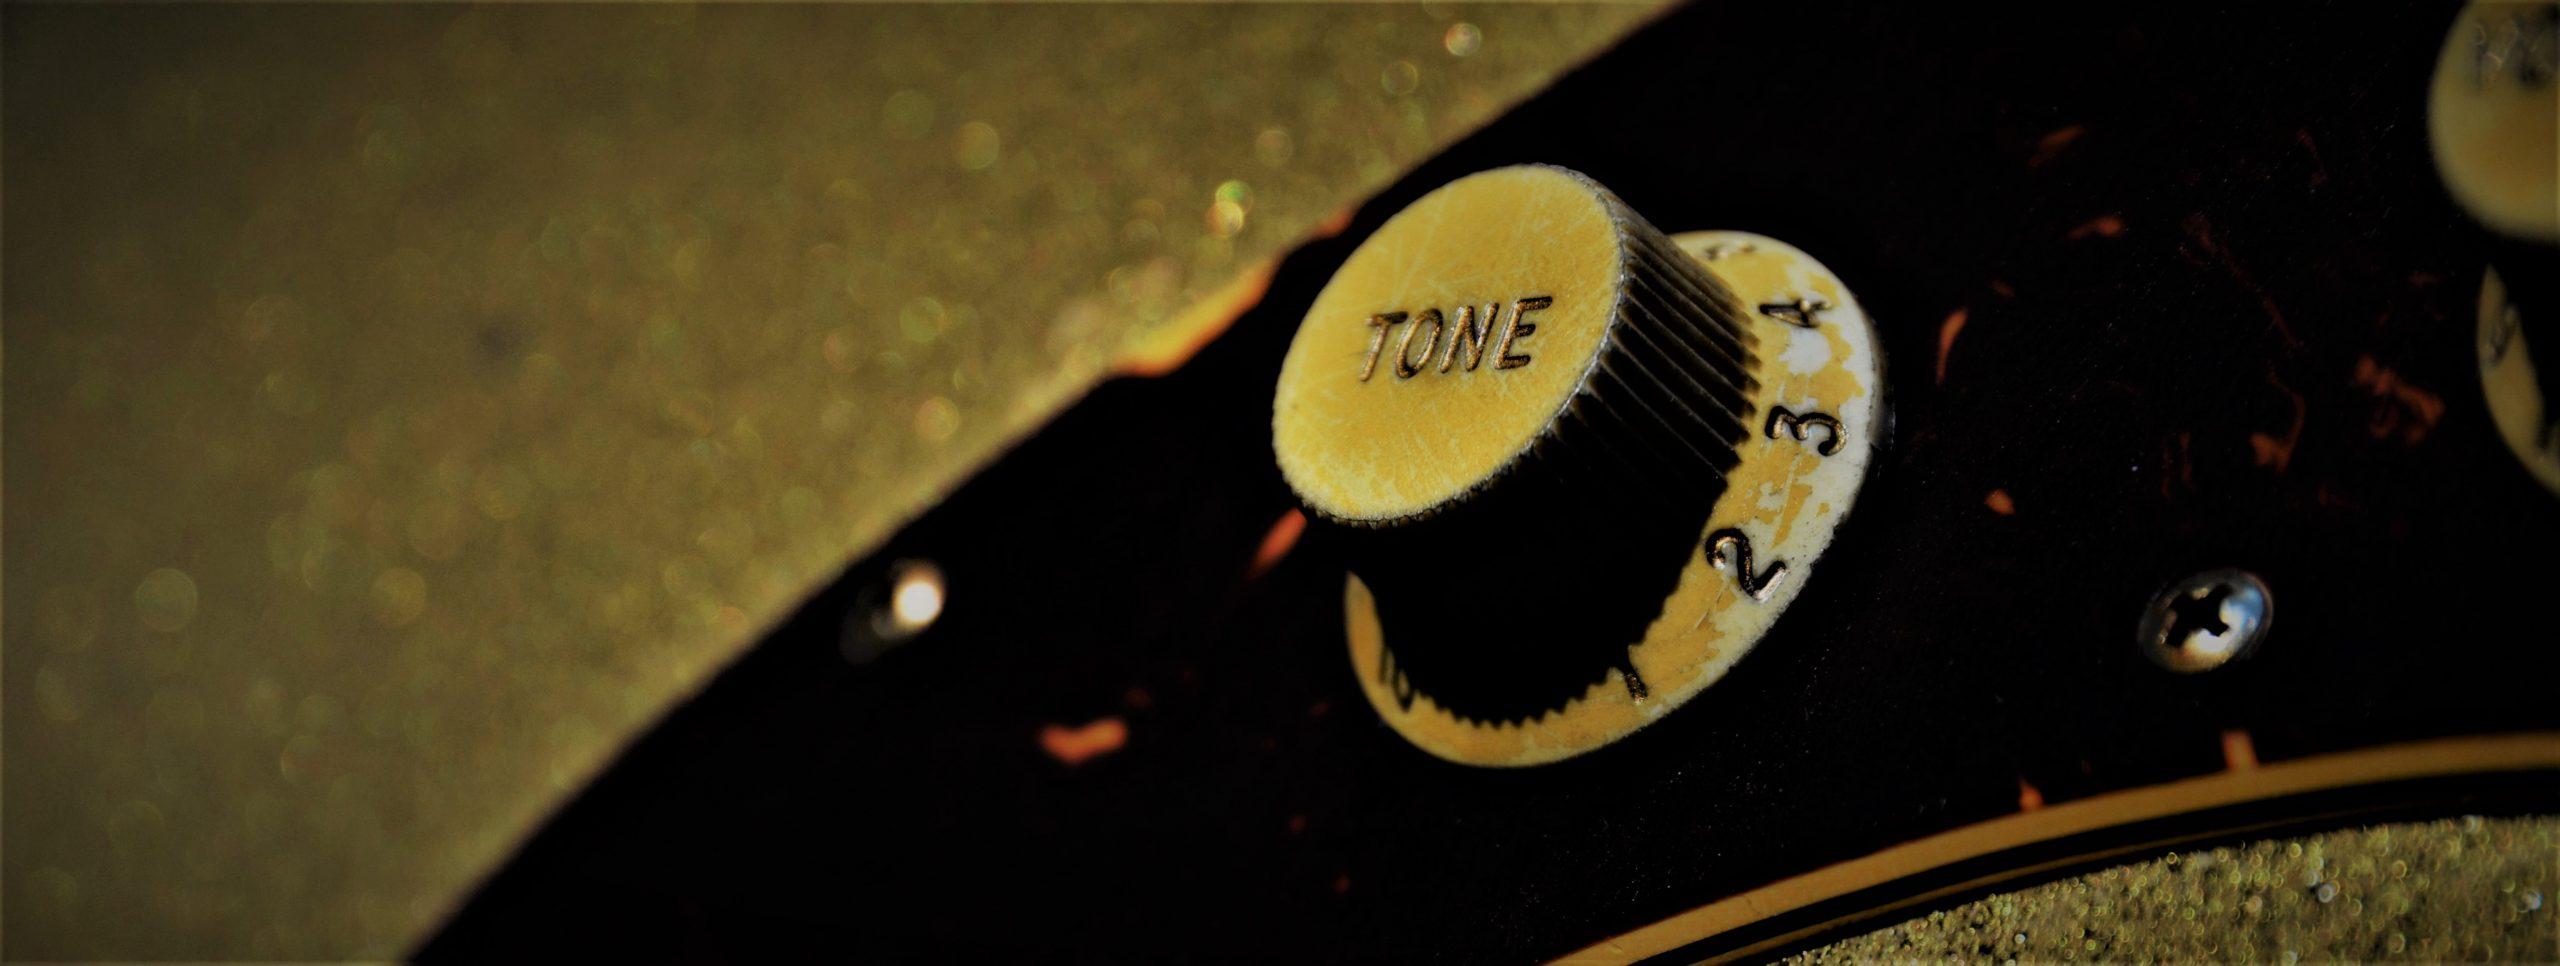 Fender Tone Knob